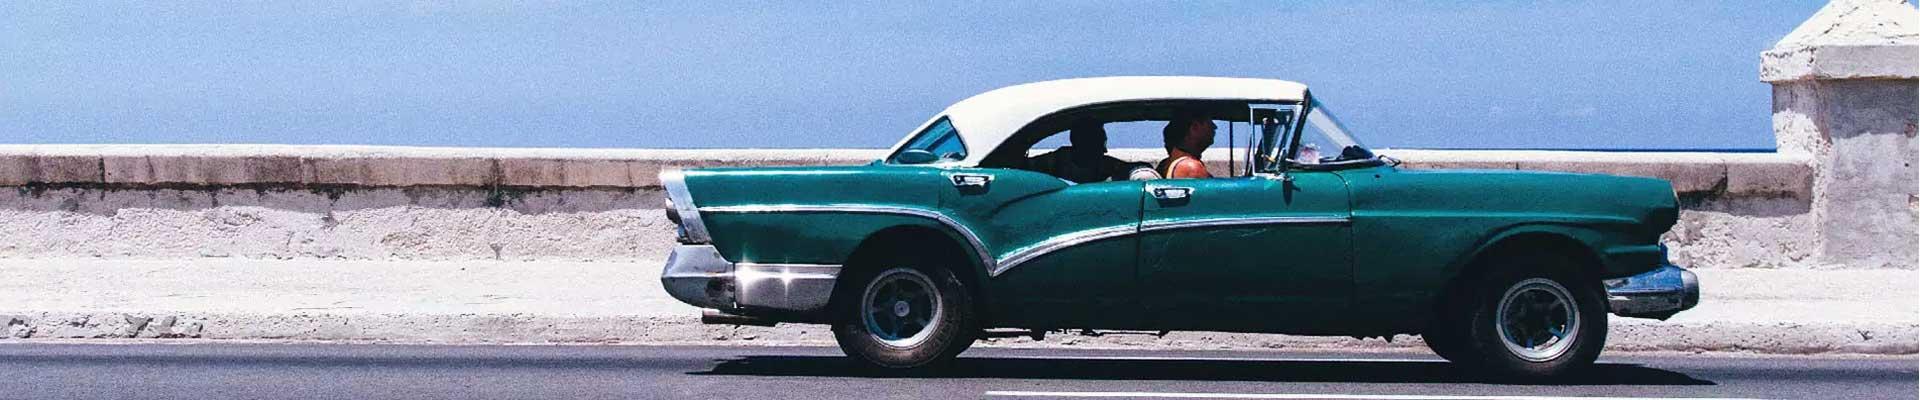 american-classic-insurance-classic-car